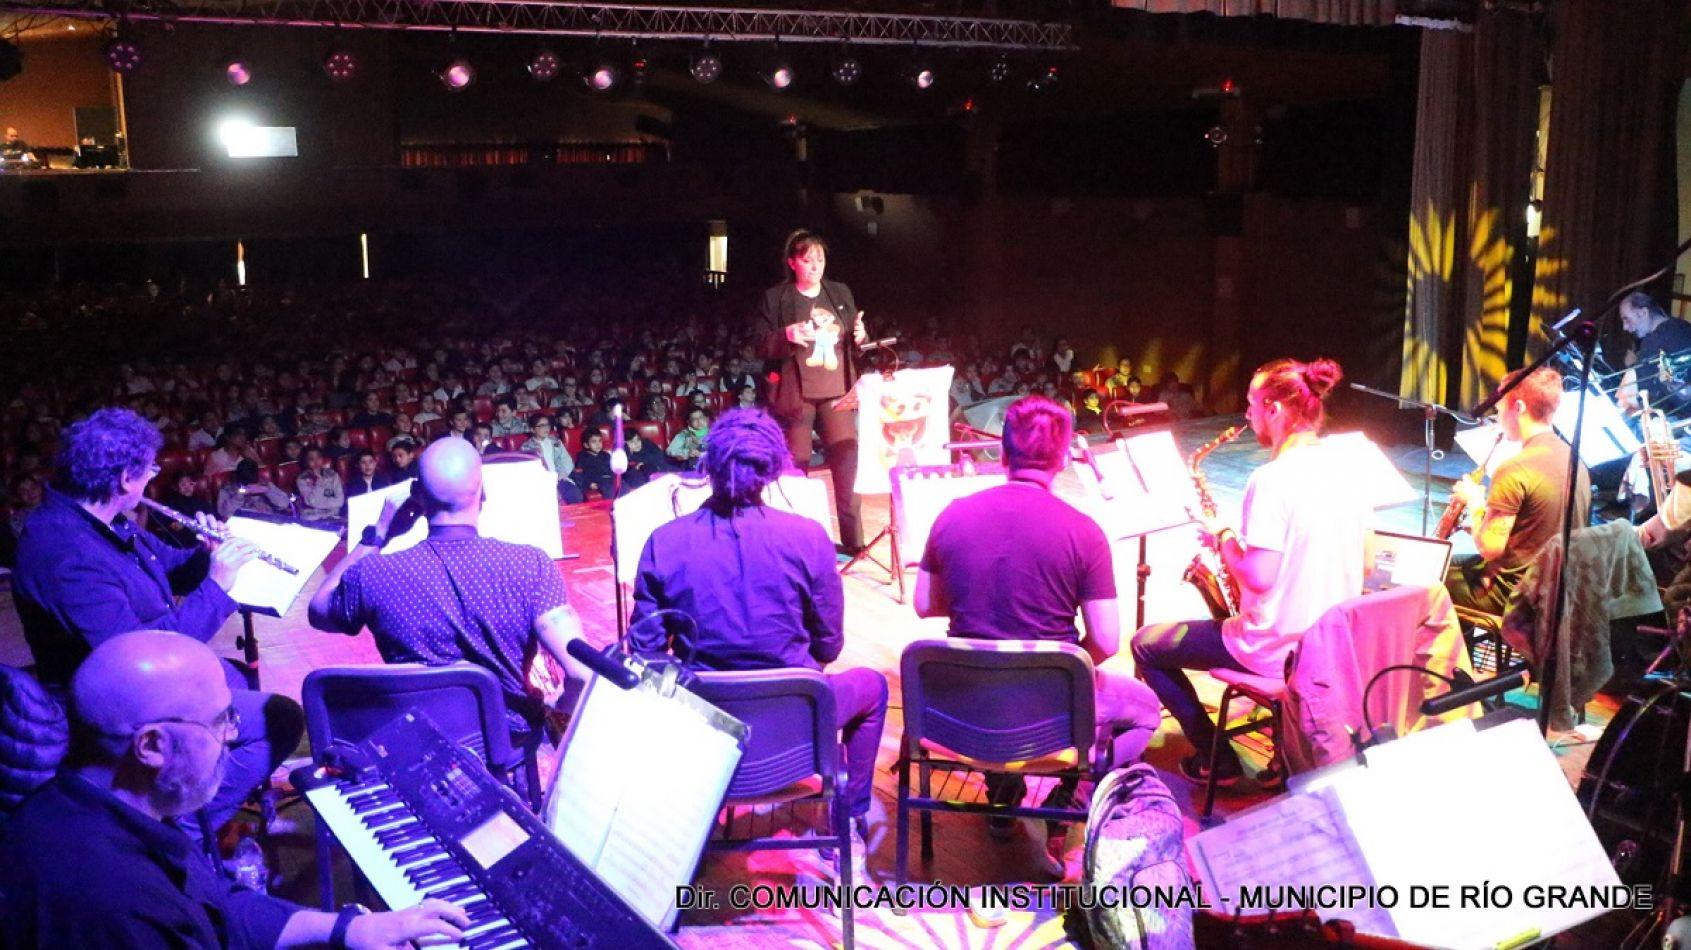 La banda municipal brindó un espectáculo musical infantil